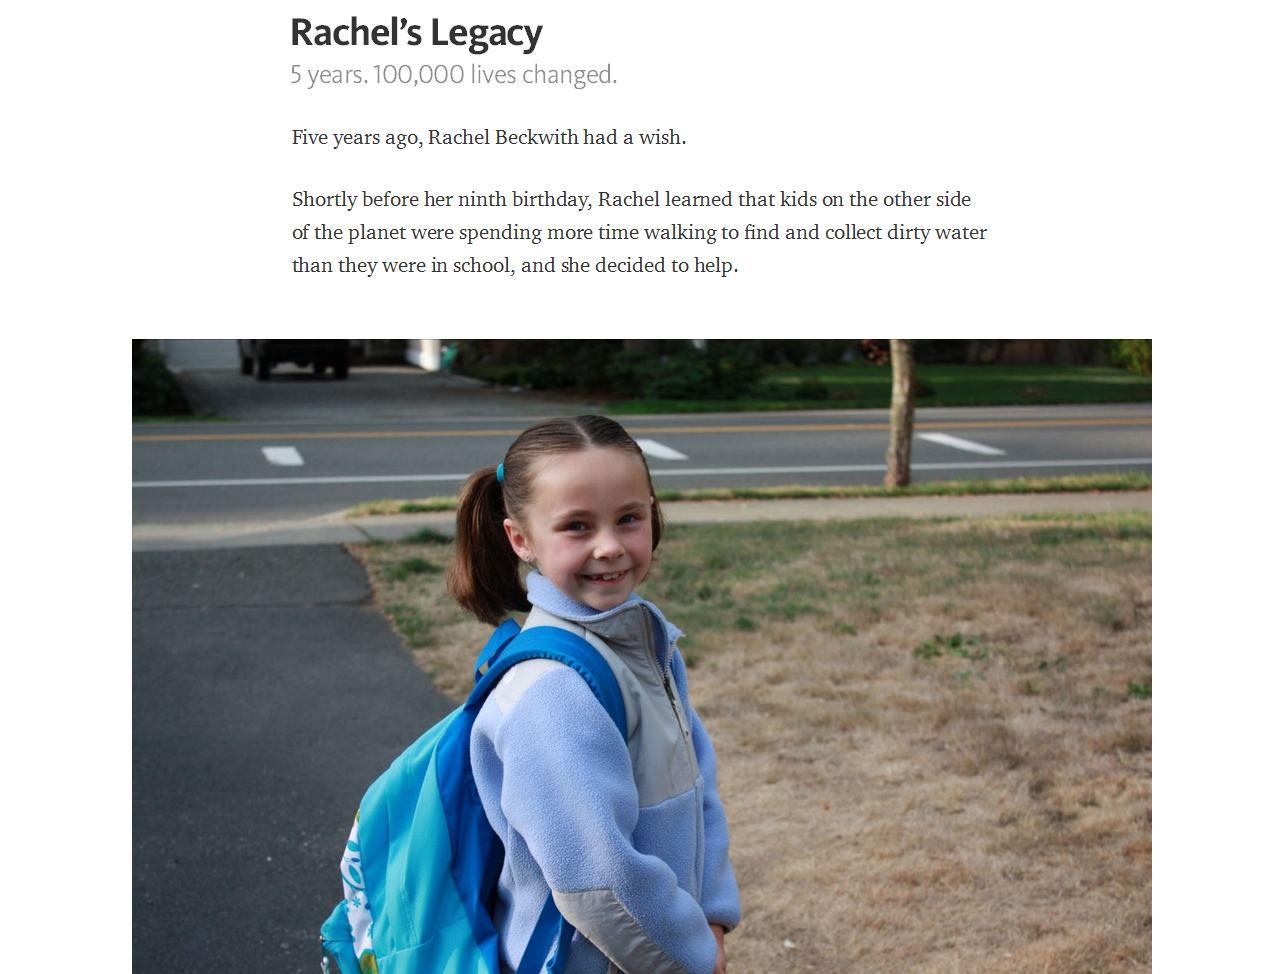 Prawdziwa historia Rachel iPeer-2-Peer Fundraising